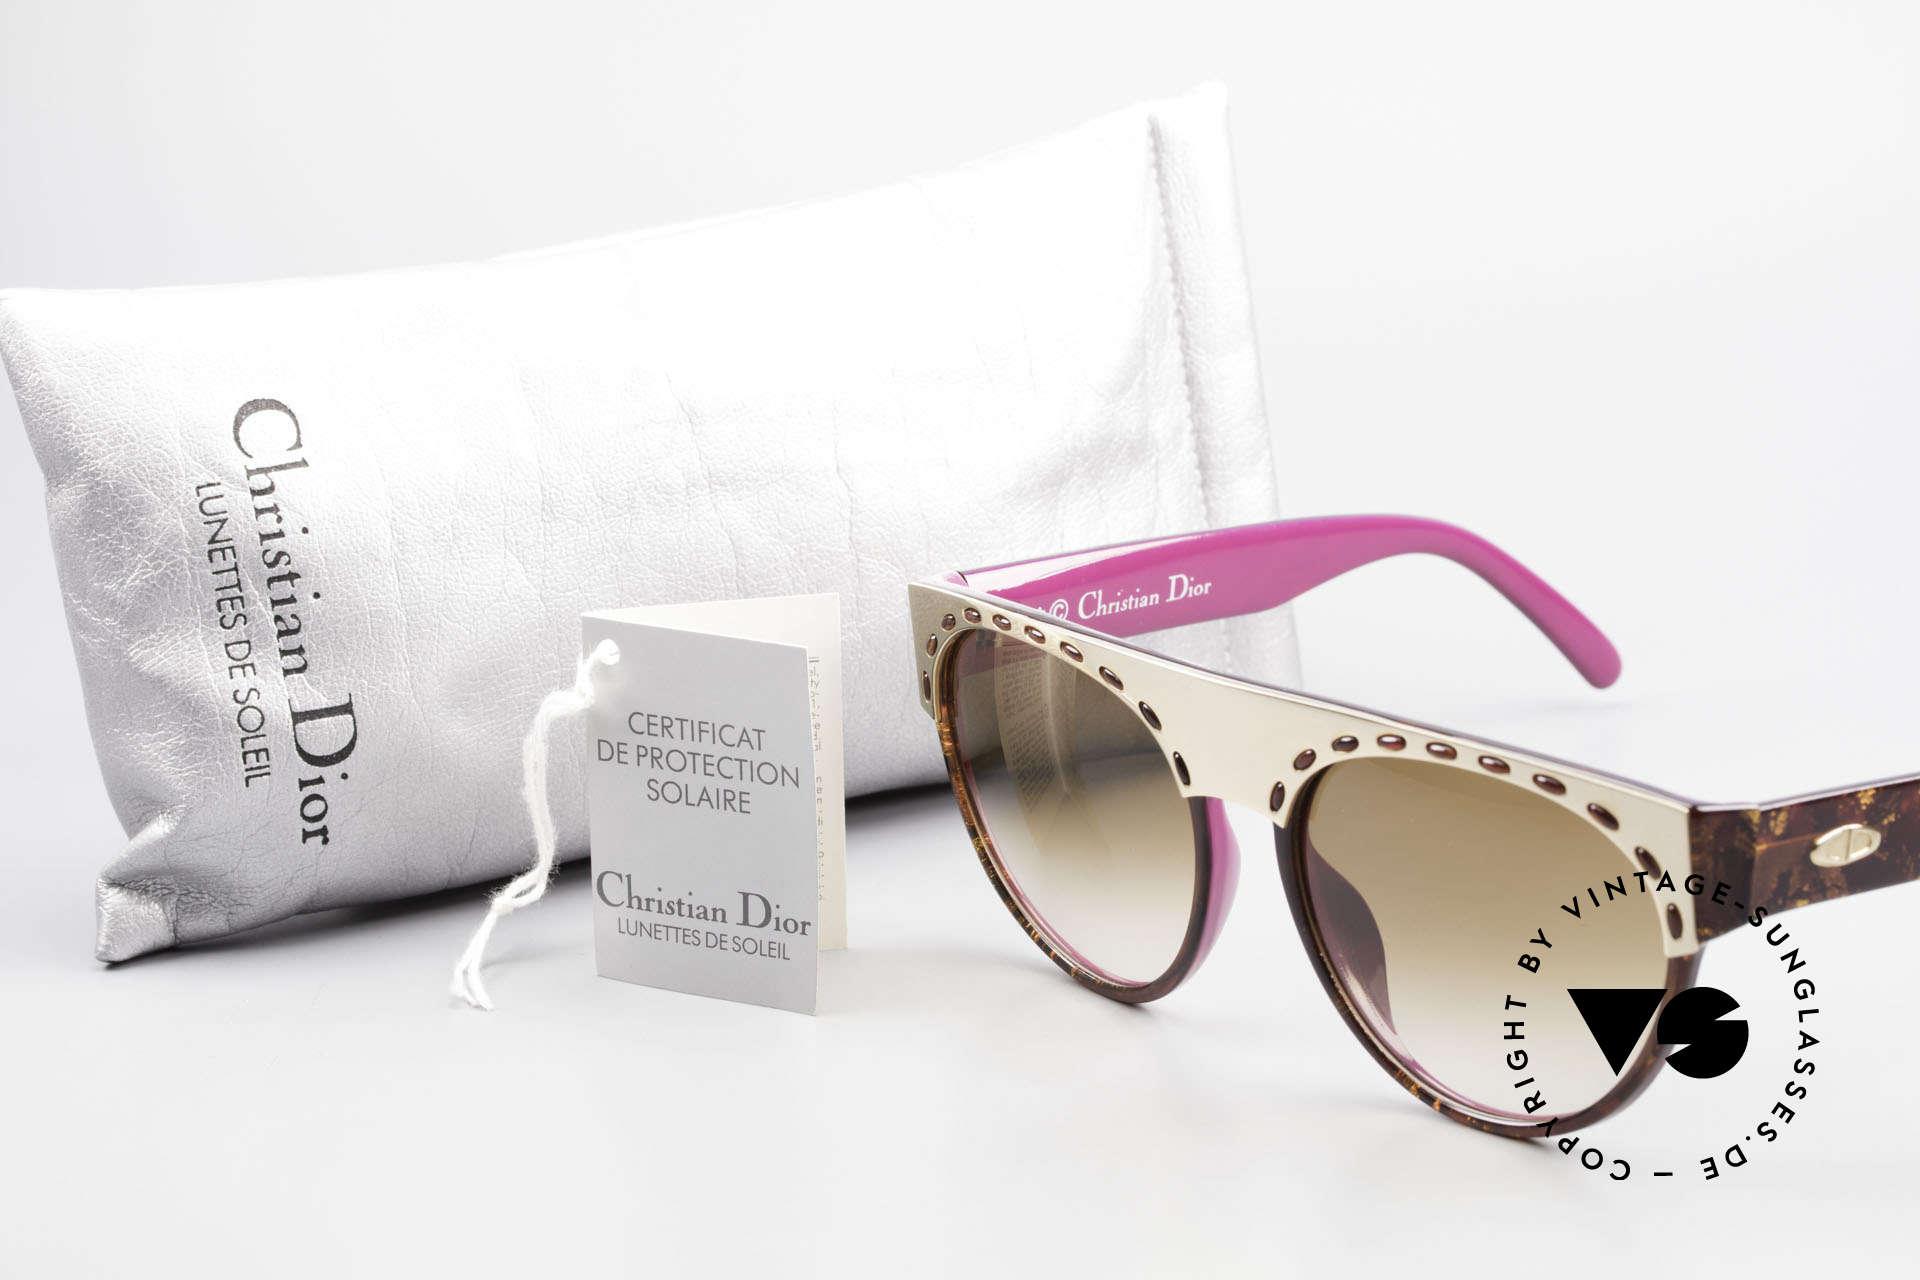 Christian Dior 2437 Ladies Sunglasses 80's Vintage, Size: medium, Made for Women